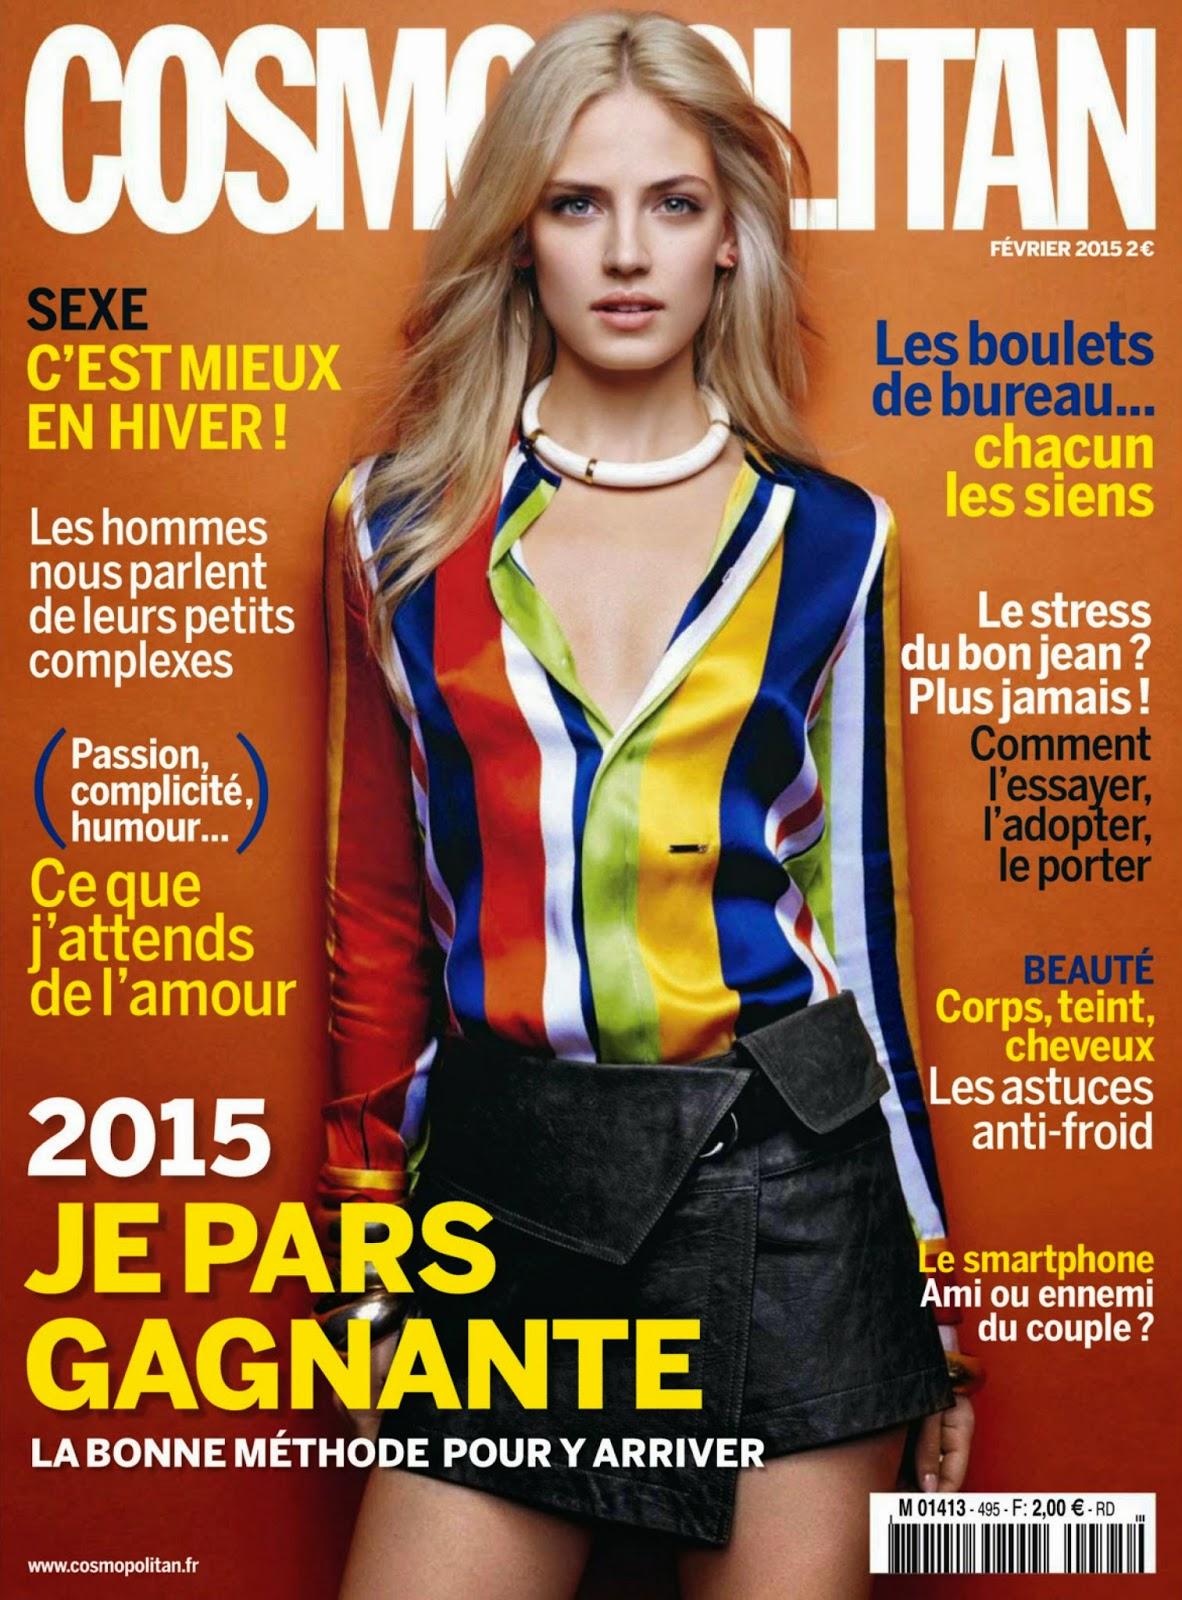 Sandra Malek, Soekie Gravenhorst for Cosmopolitan, France